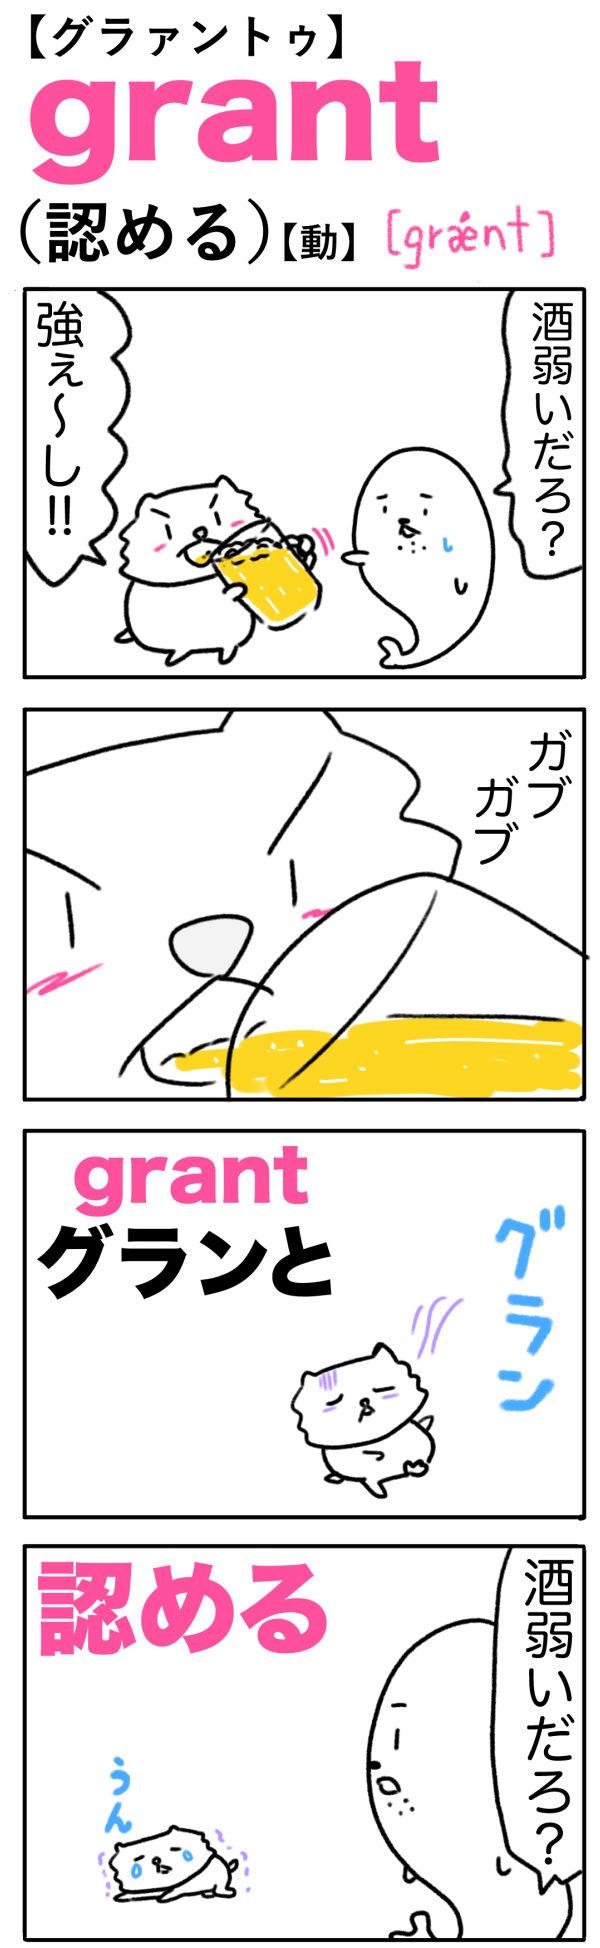 grant(認める)の語呂合わせ英単語